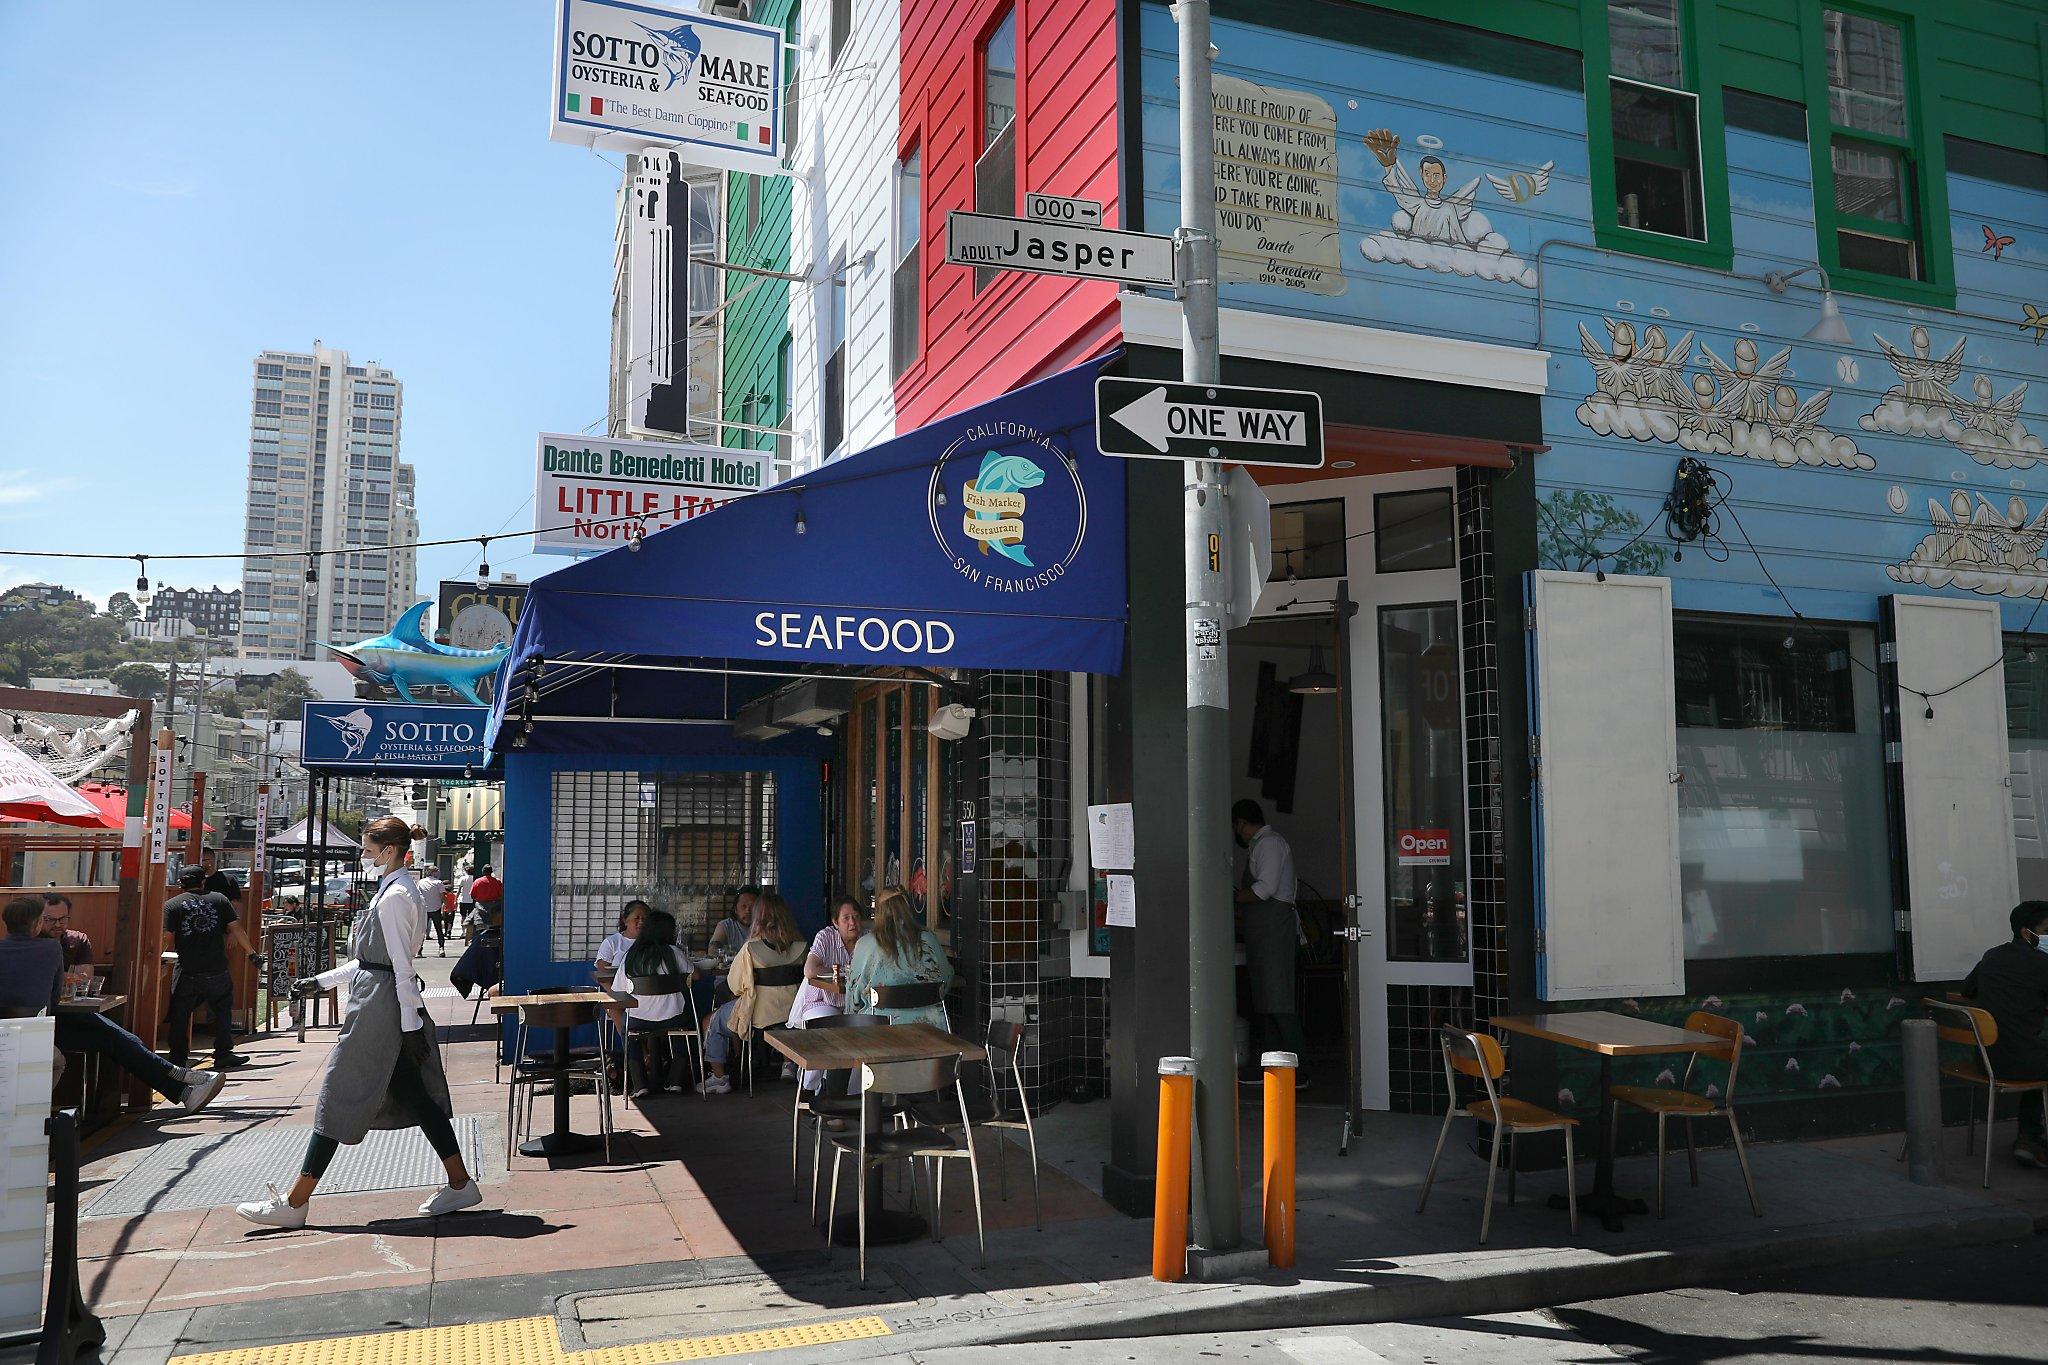 Seafood on display at San Francisco's new California Fish Market Restaurant